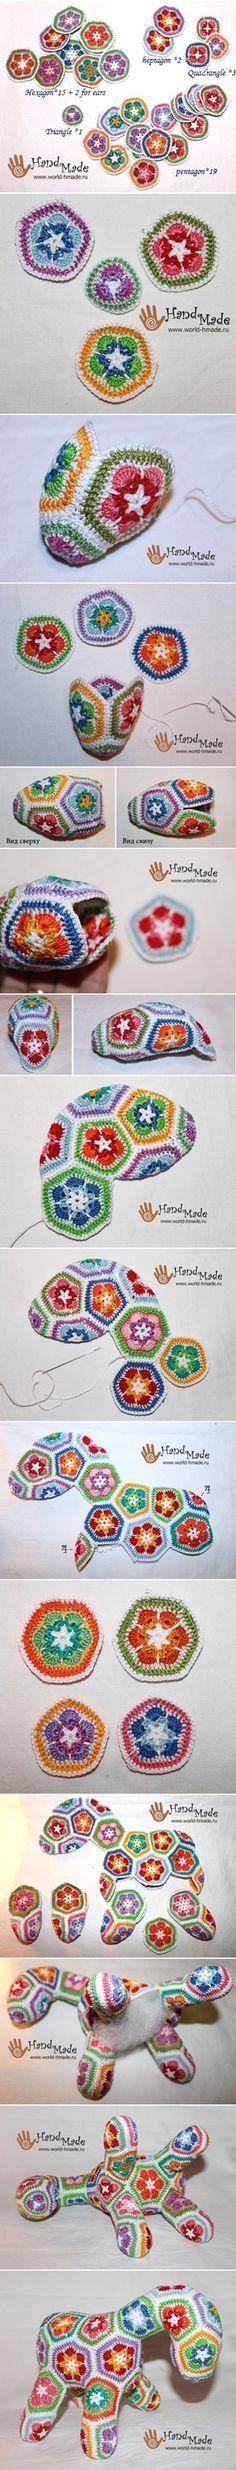 "Crochet ""Afrain Flower"" Horse DIY   www.FabricArtDIY.com"